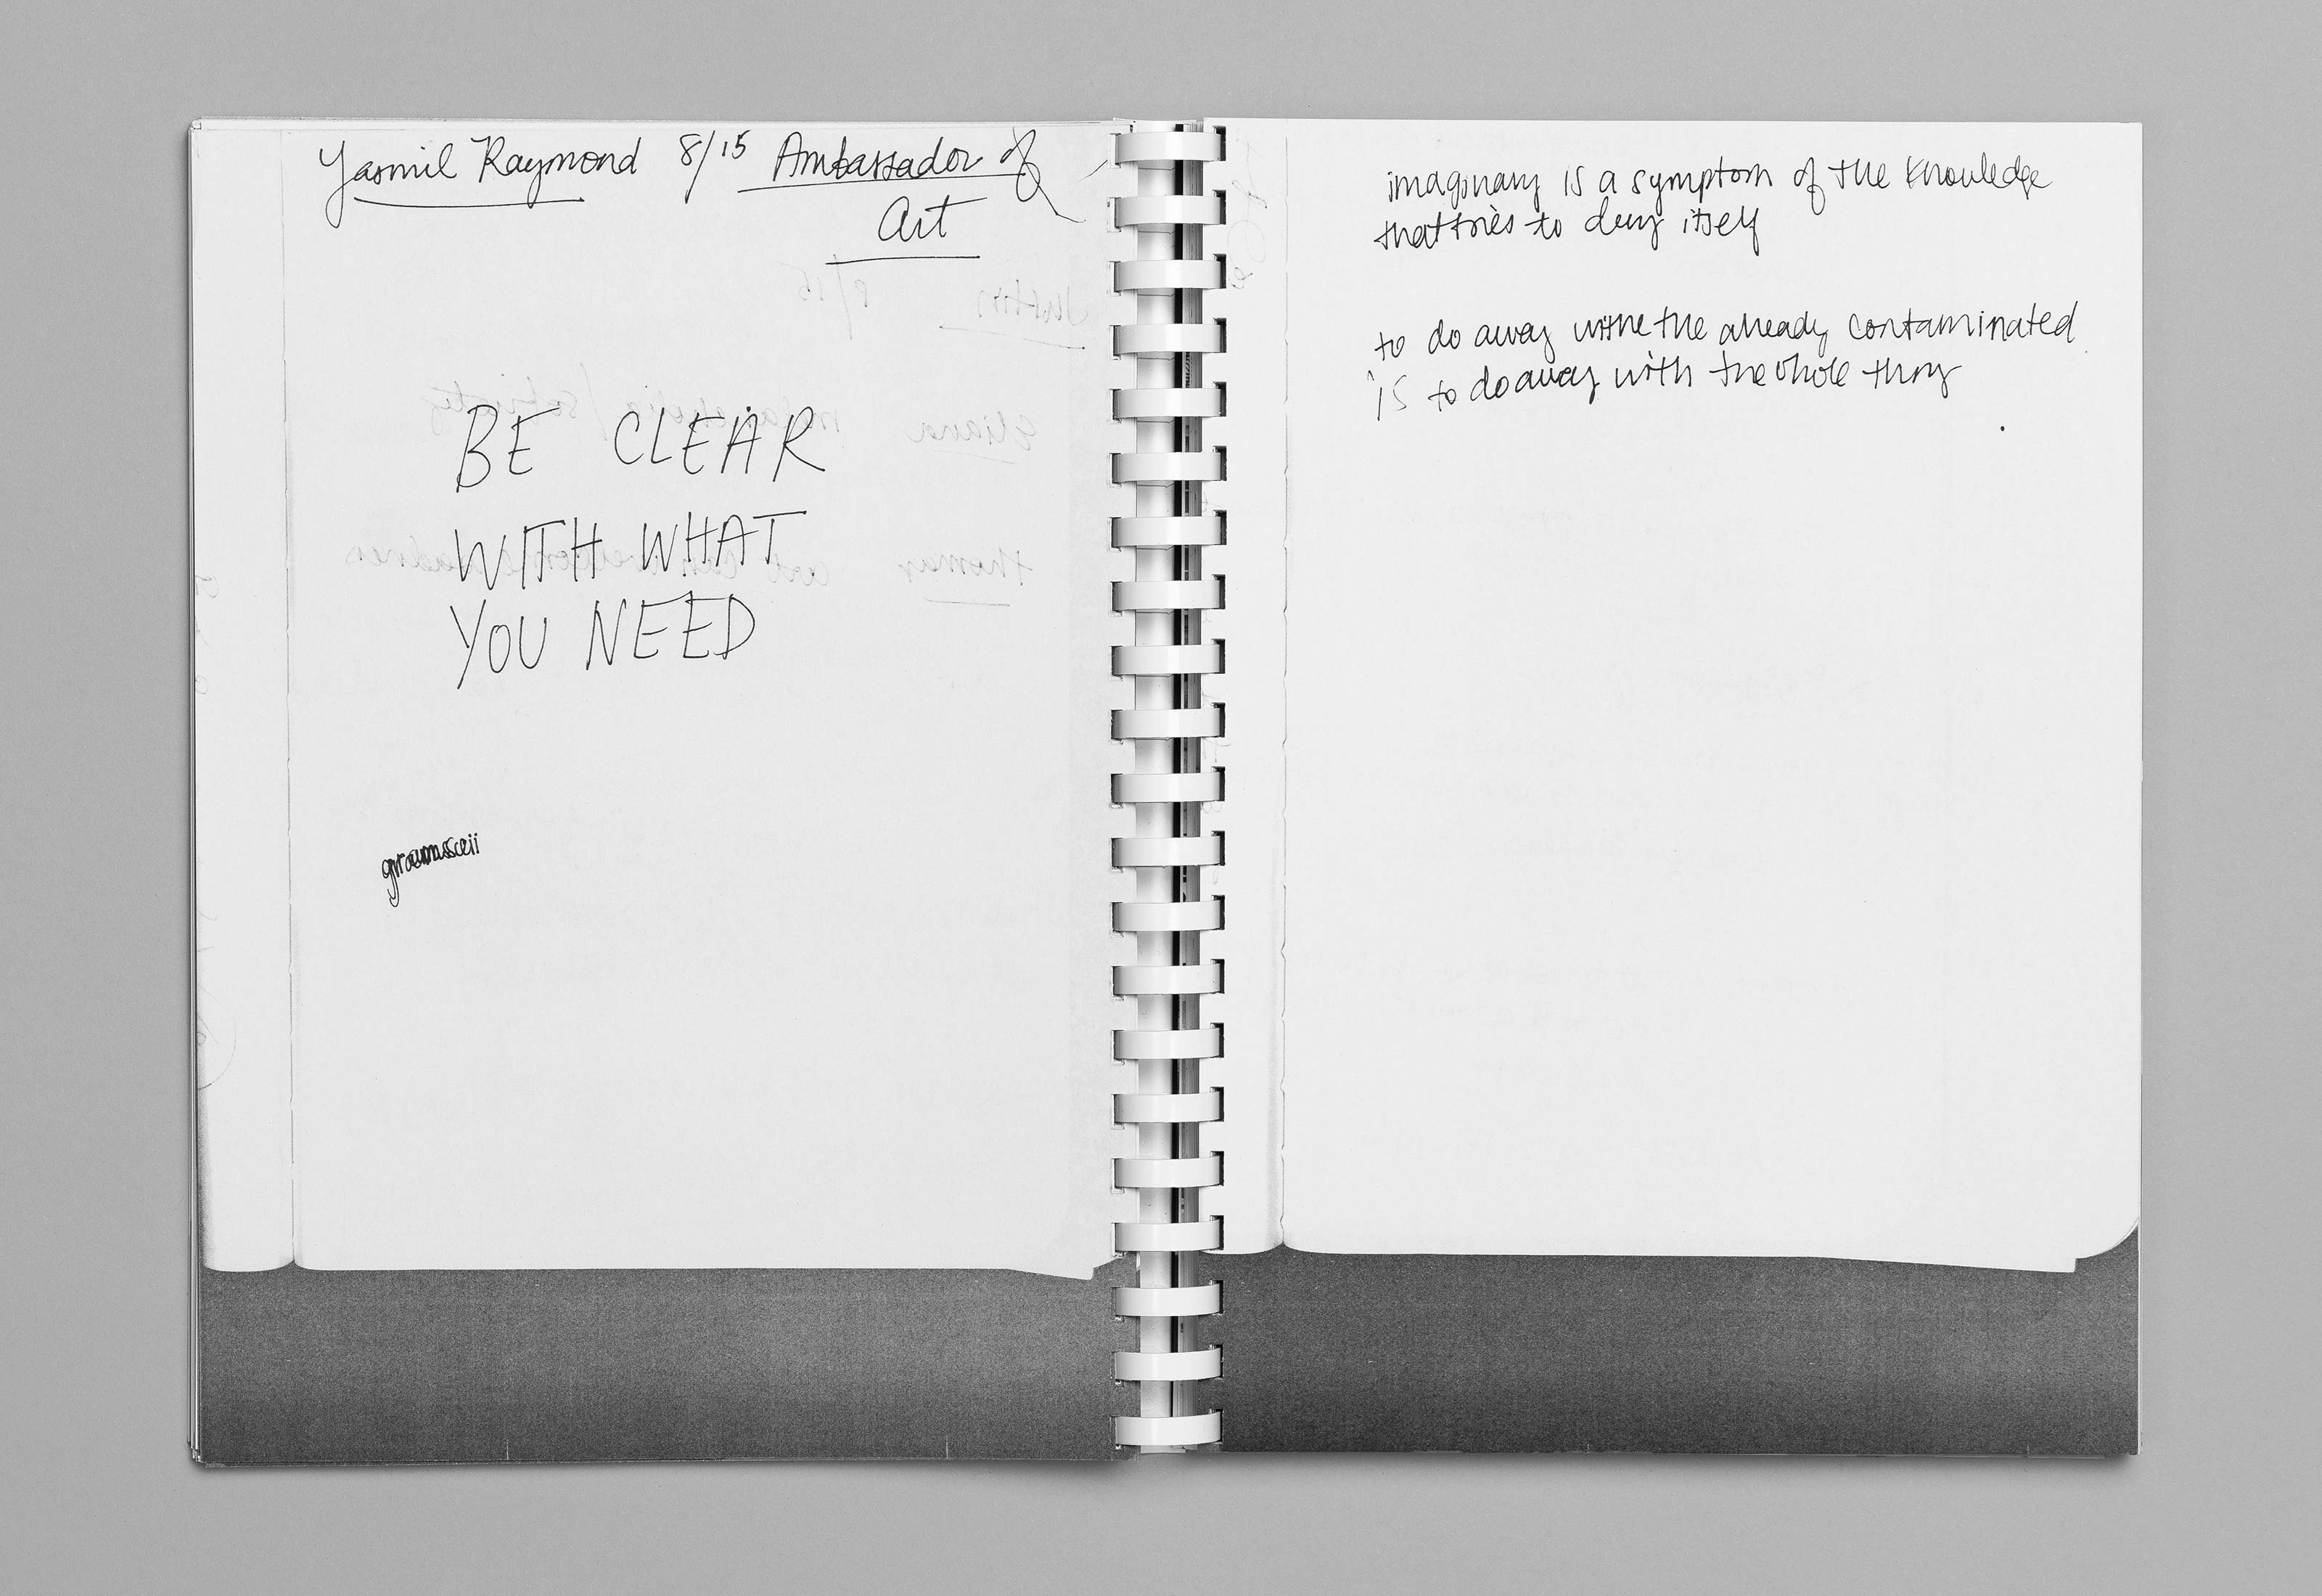 Sommerakademie im Zentrum Paul Klee 2016 – Publikation Thomas Hirschhorn, 10  ©Atelier Pol